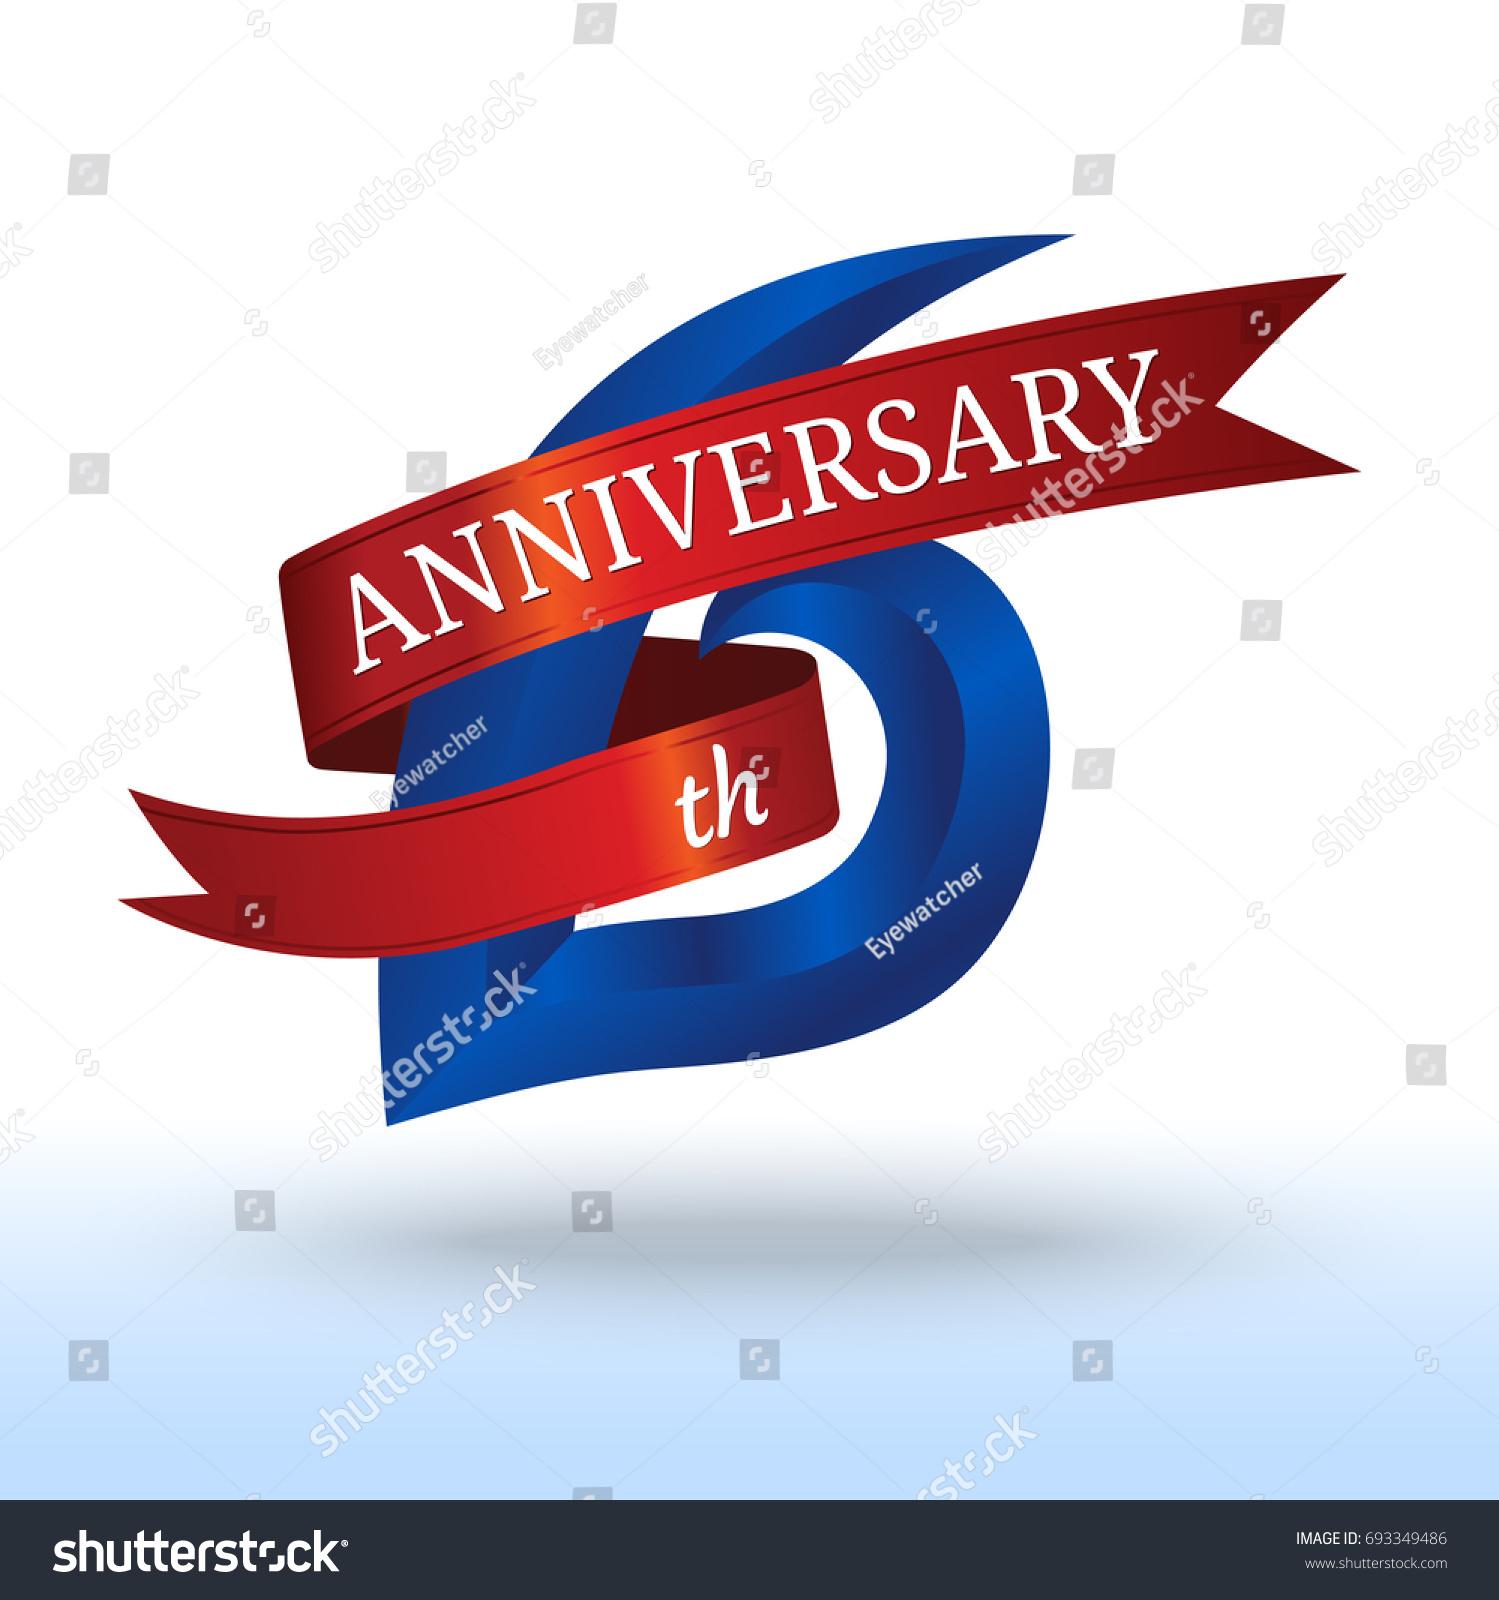 6th years anniversary symbol vector stock vector 693349486 6th years anniversary symbol vector buycottarizona